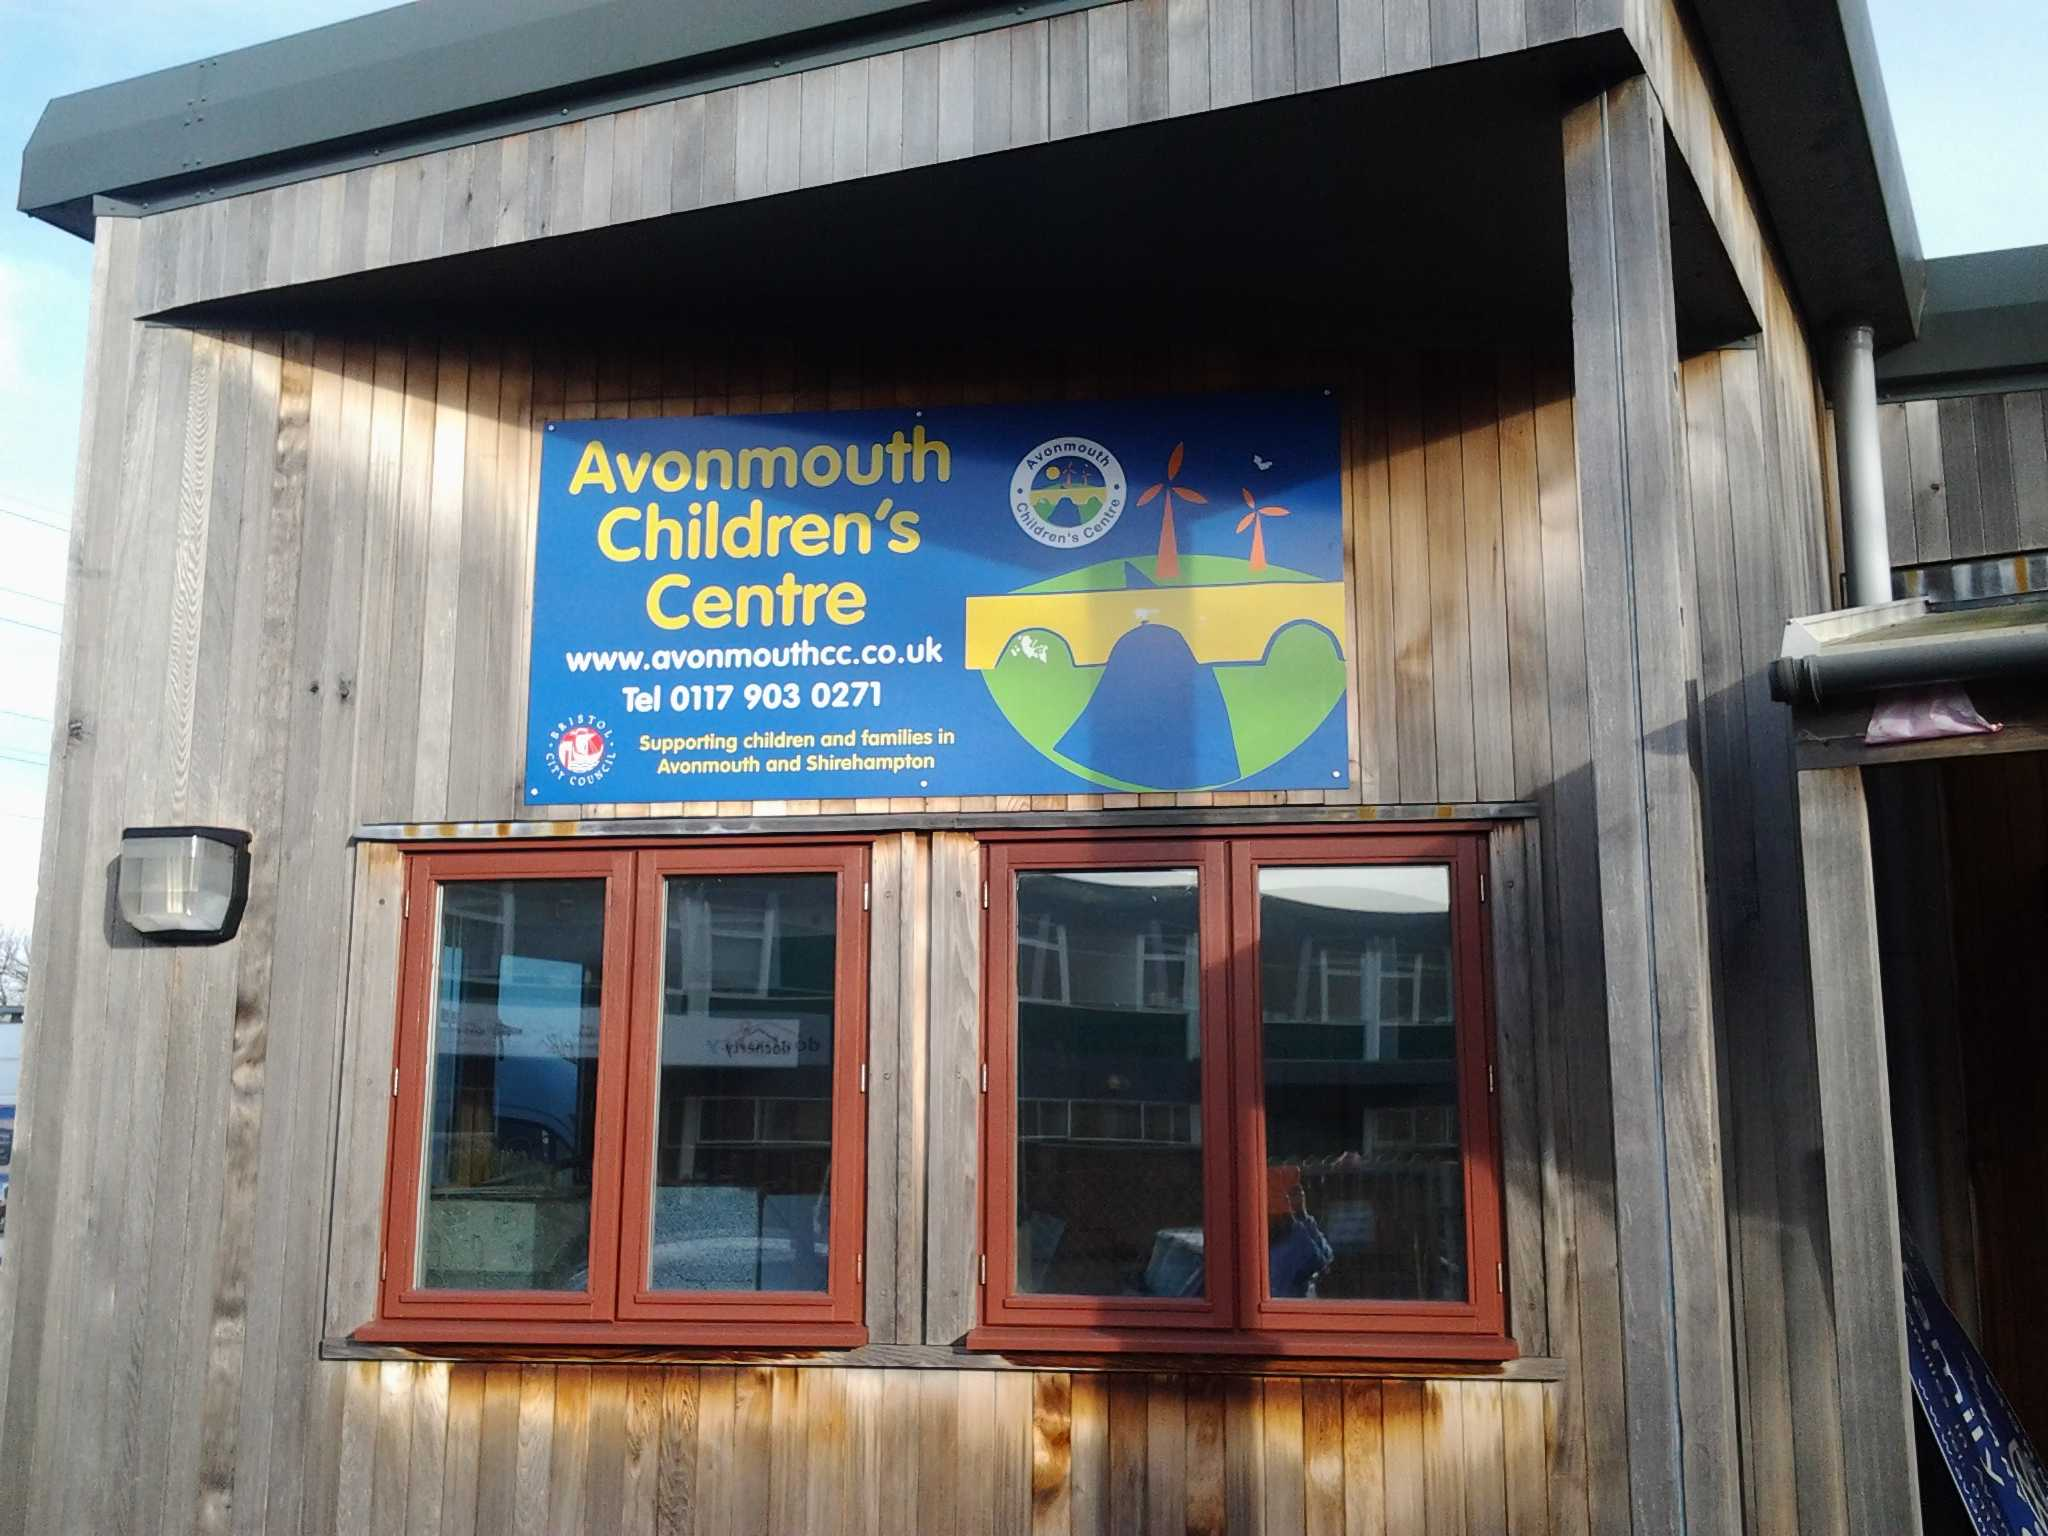 Avonmouth Childrens Centre